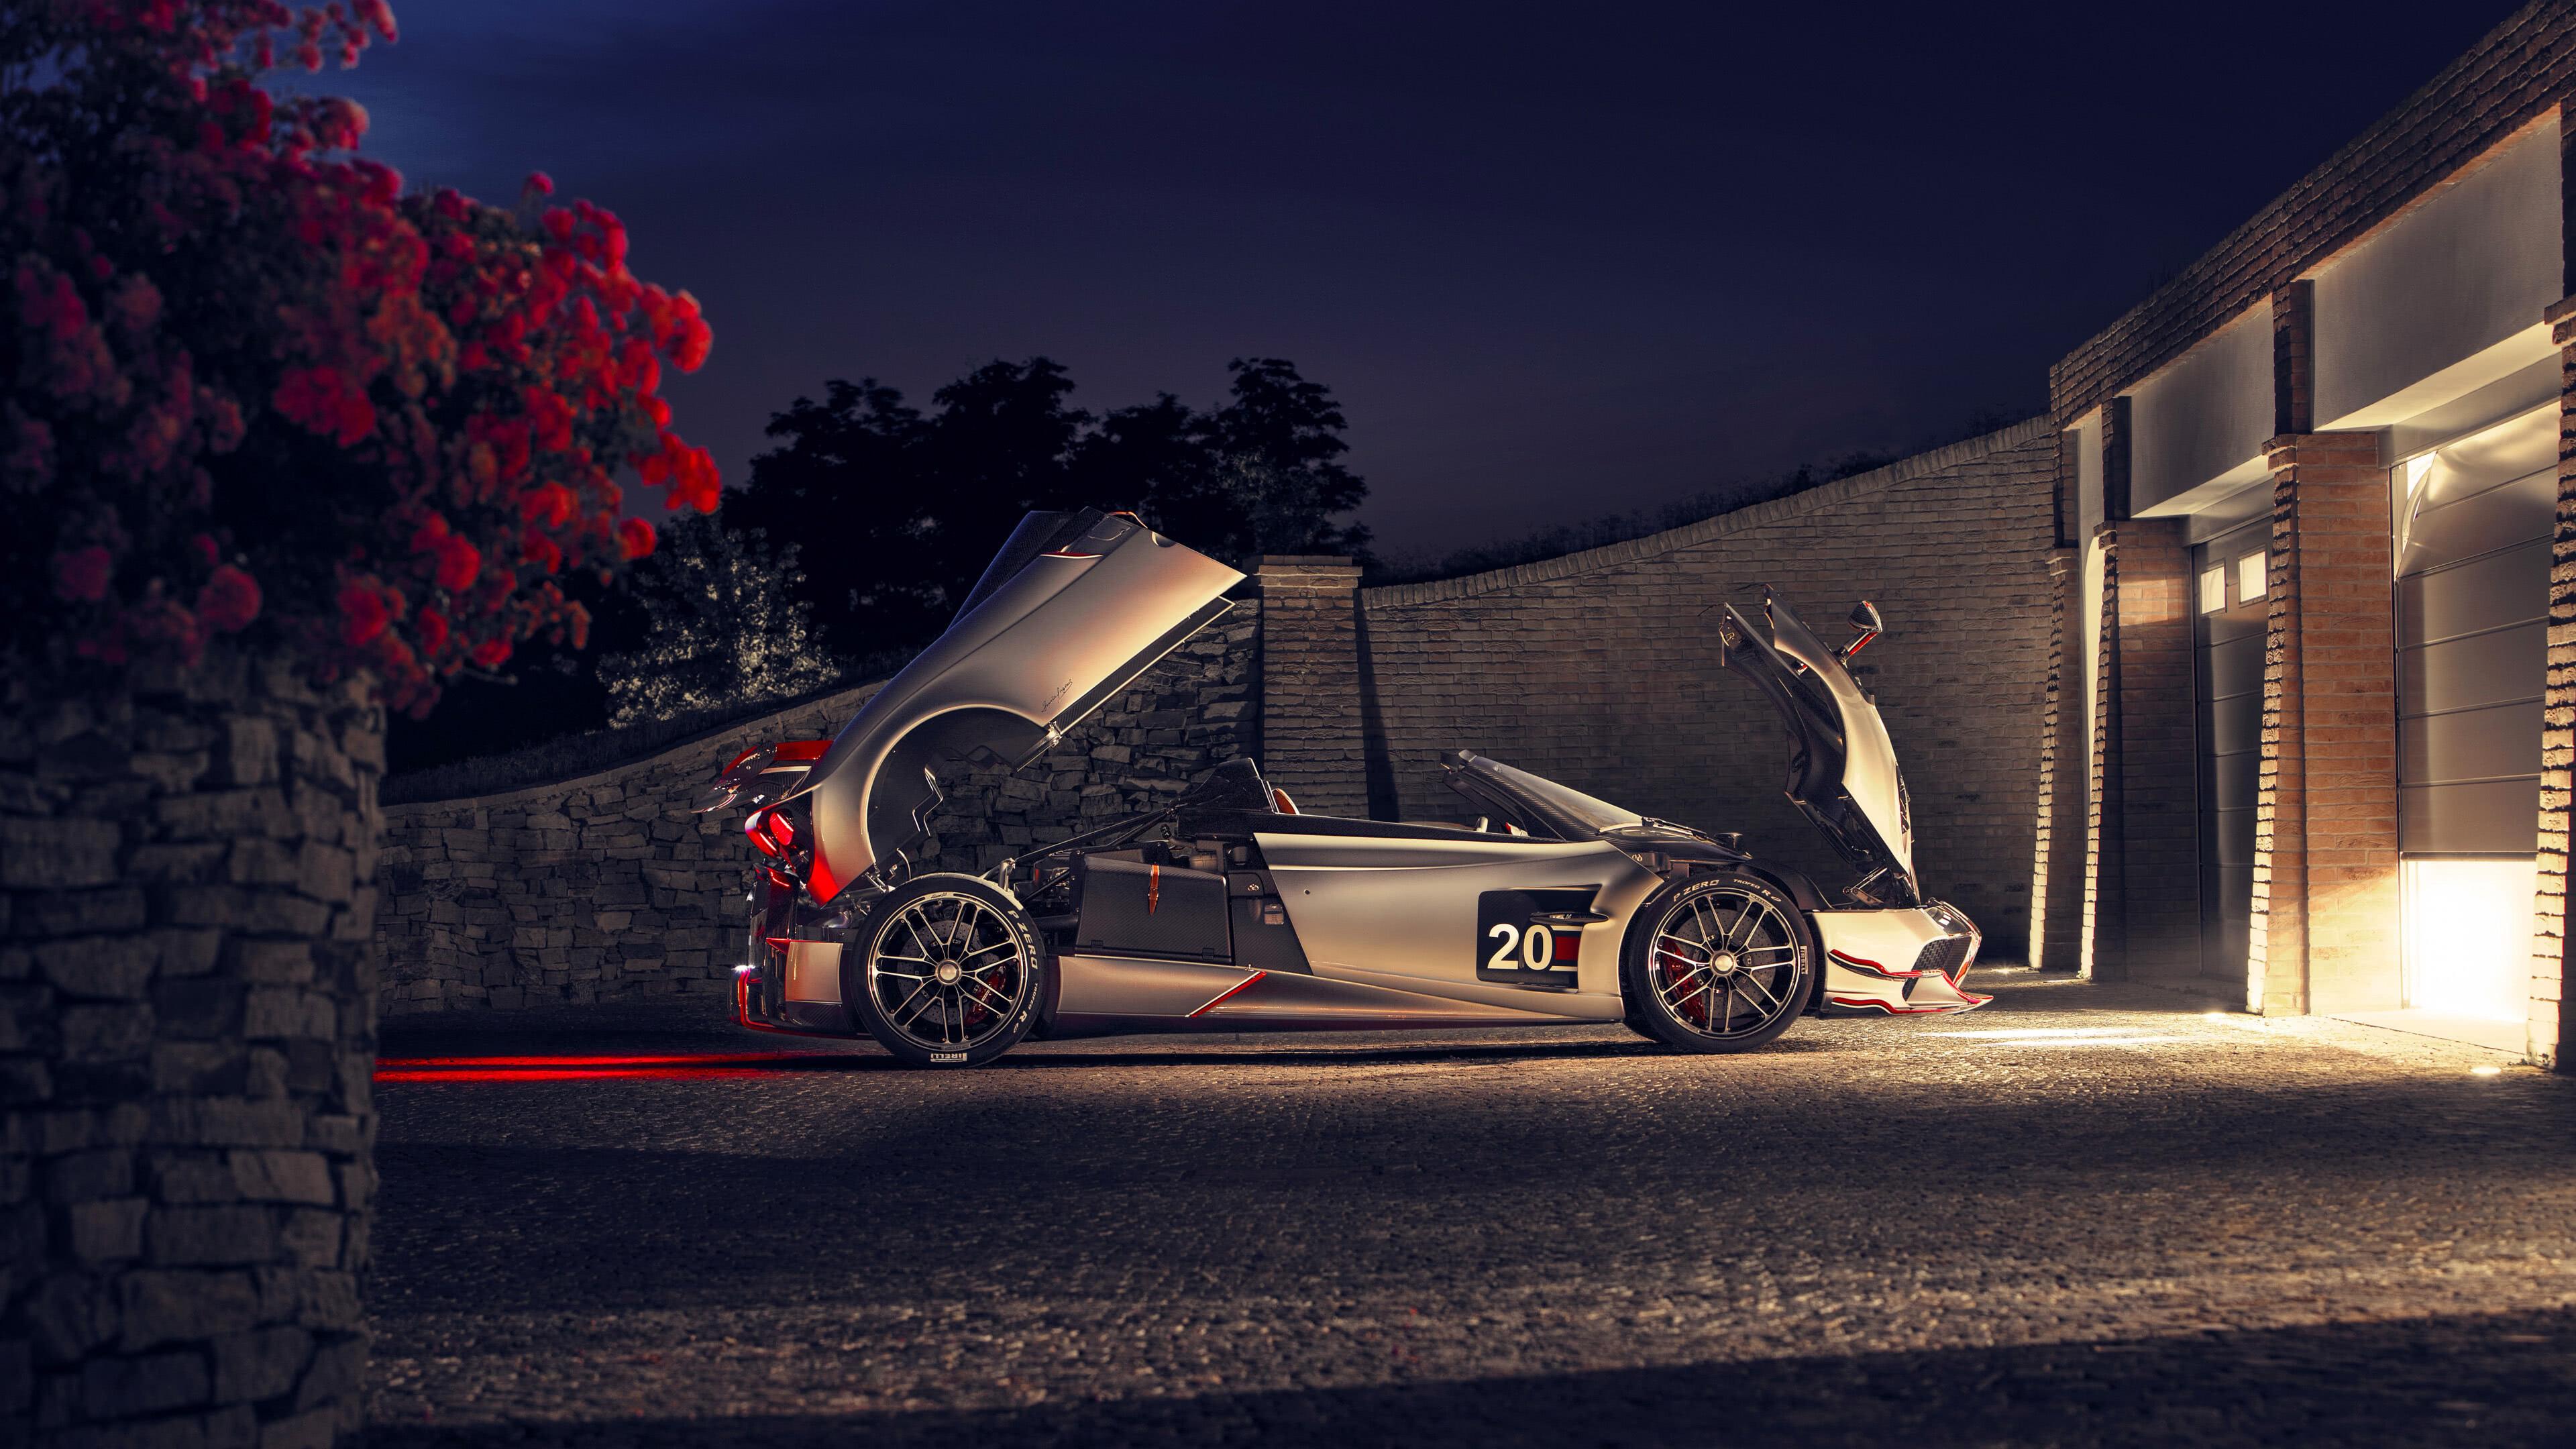 pagani huayra roadster bc side uhd 4k wallpaper